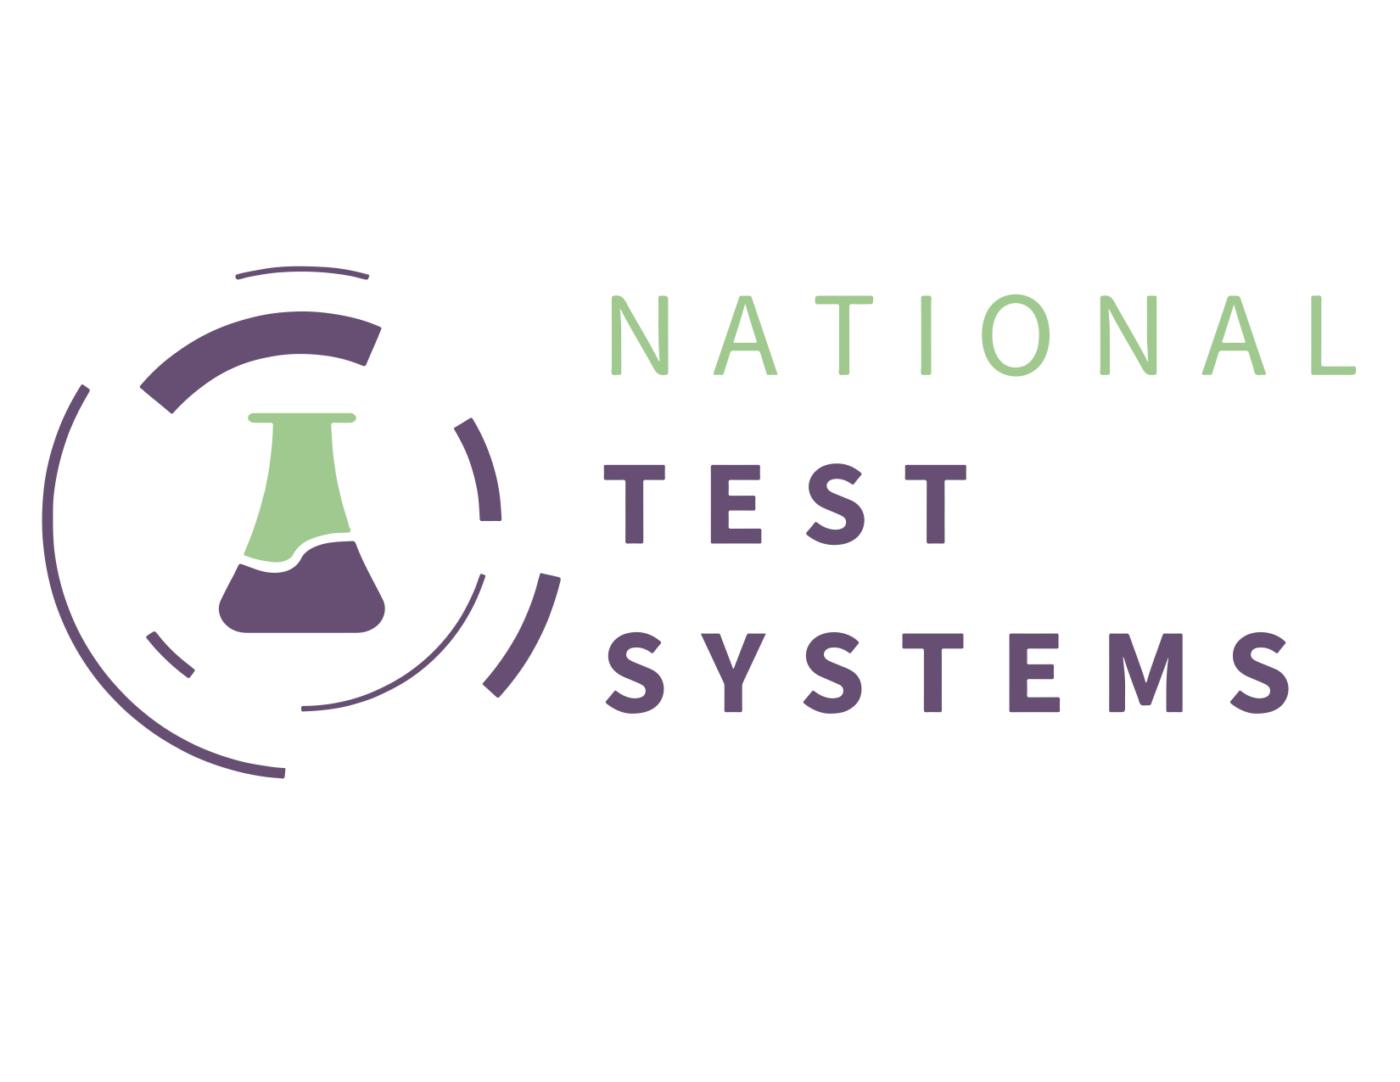 National Testing Systems company logo